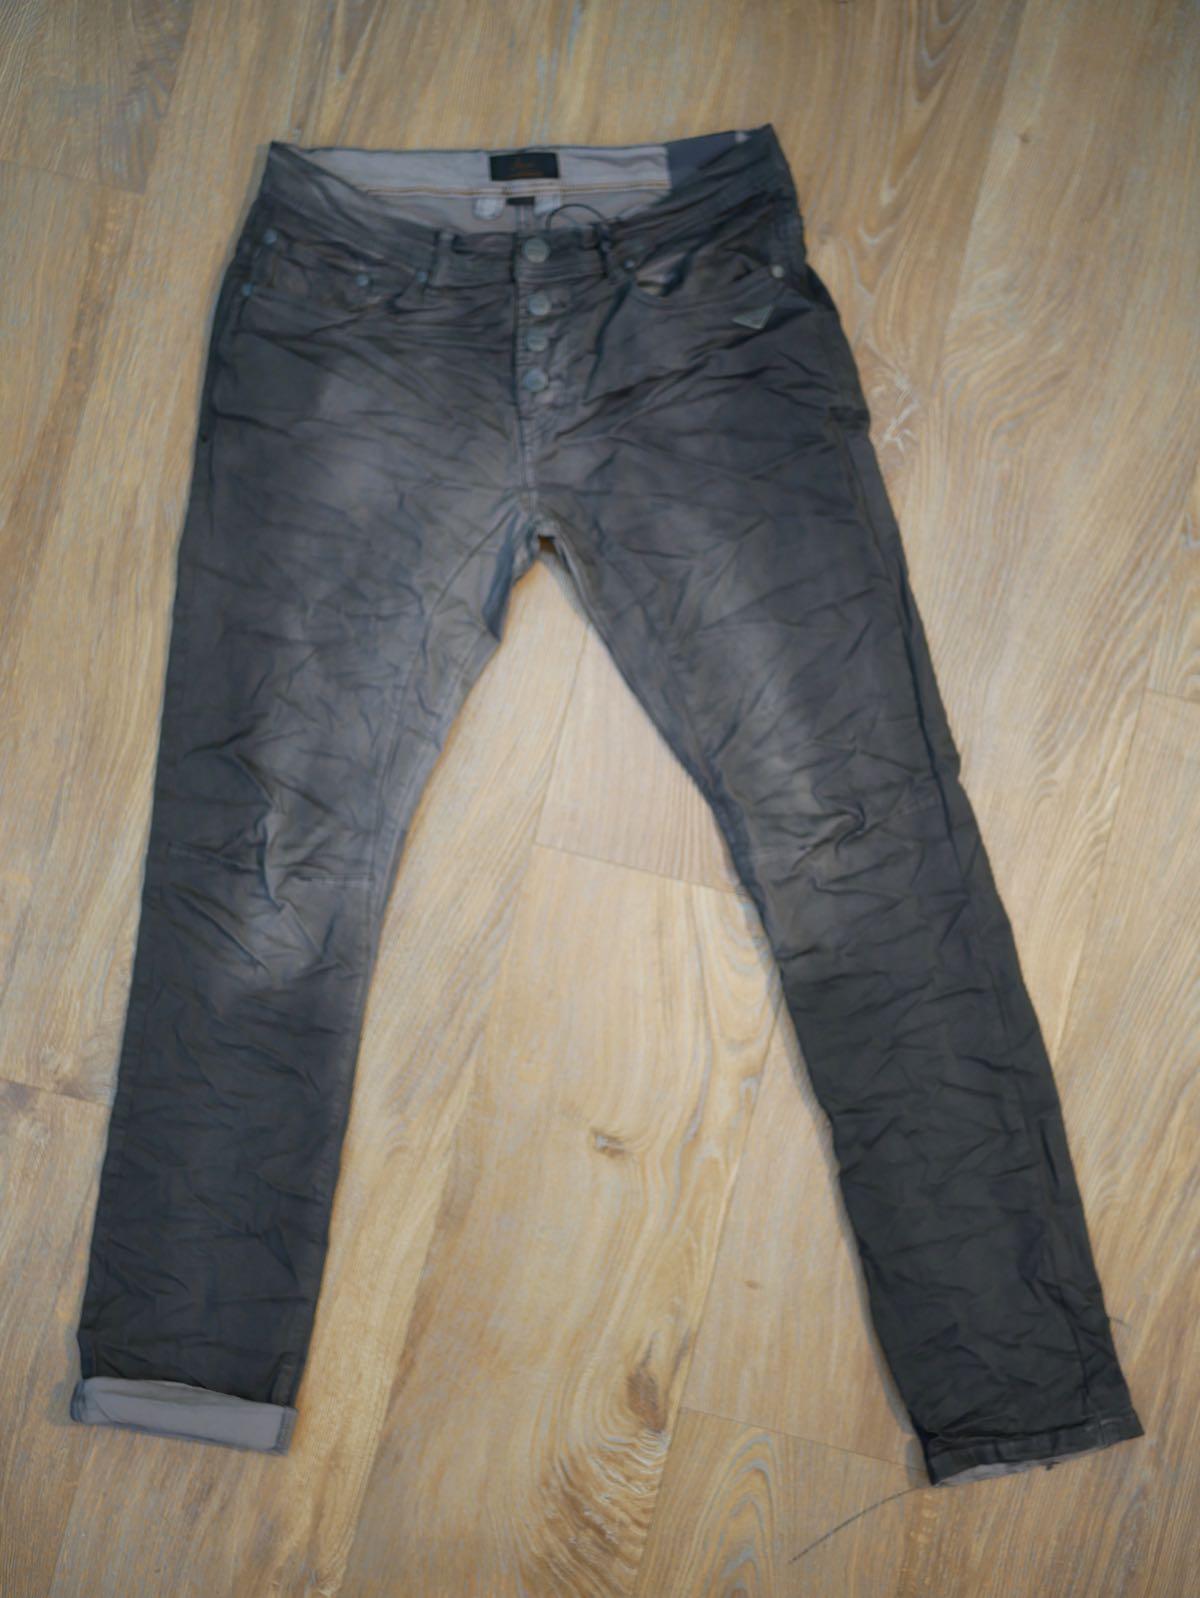 jeans franco coated twill modehaus rieker s en kreis g ppingen genau zwischen geislingen. Black Bedroom Furniture Sets. Home Design Ideas